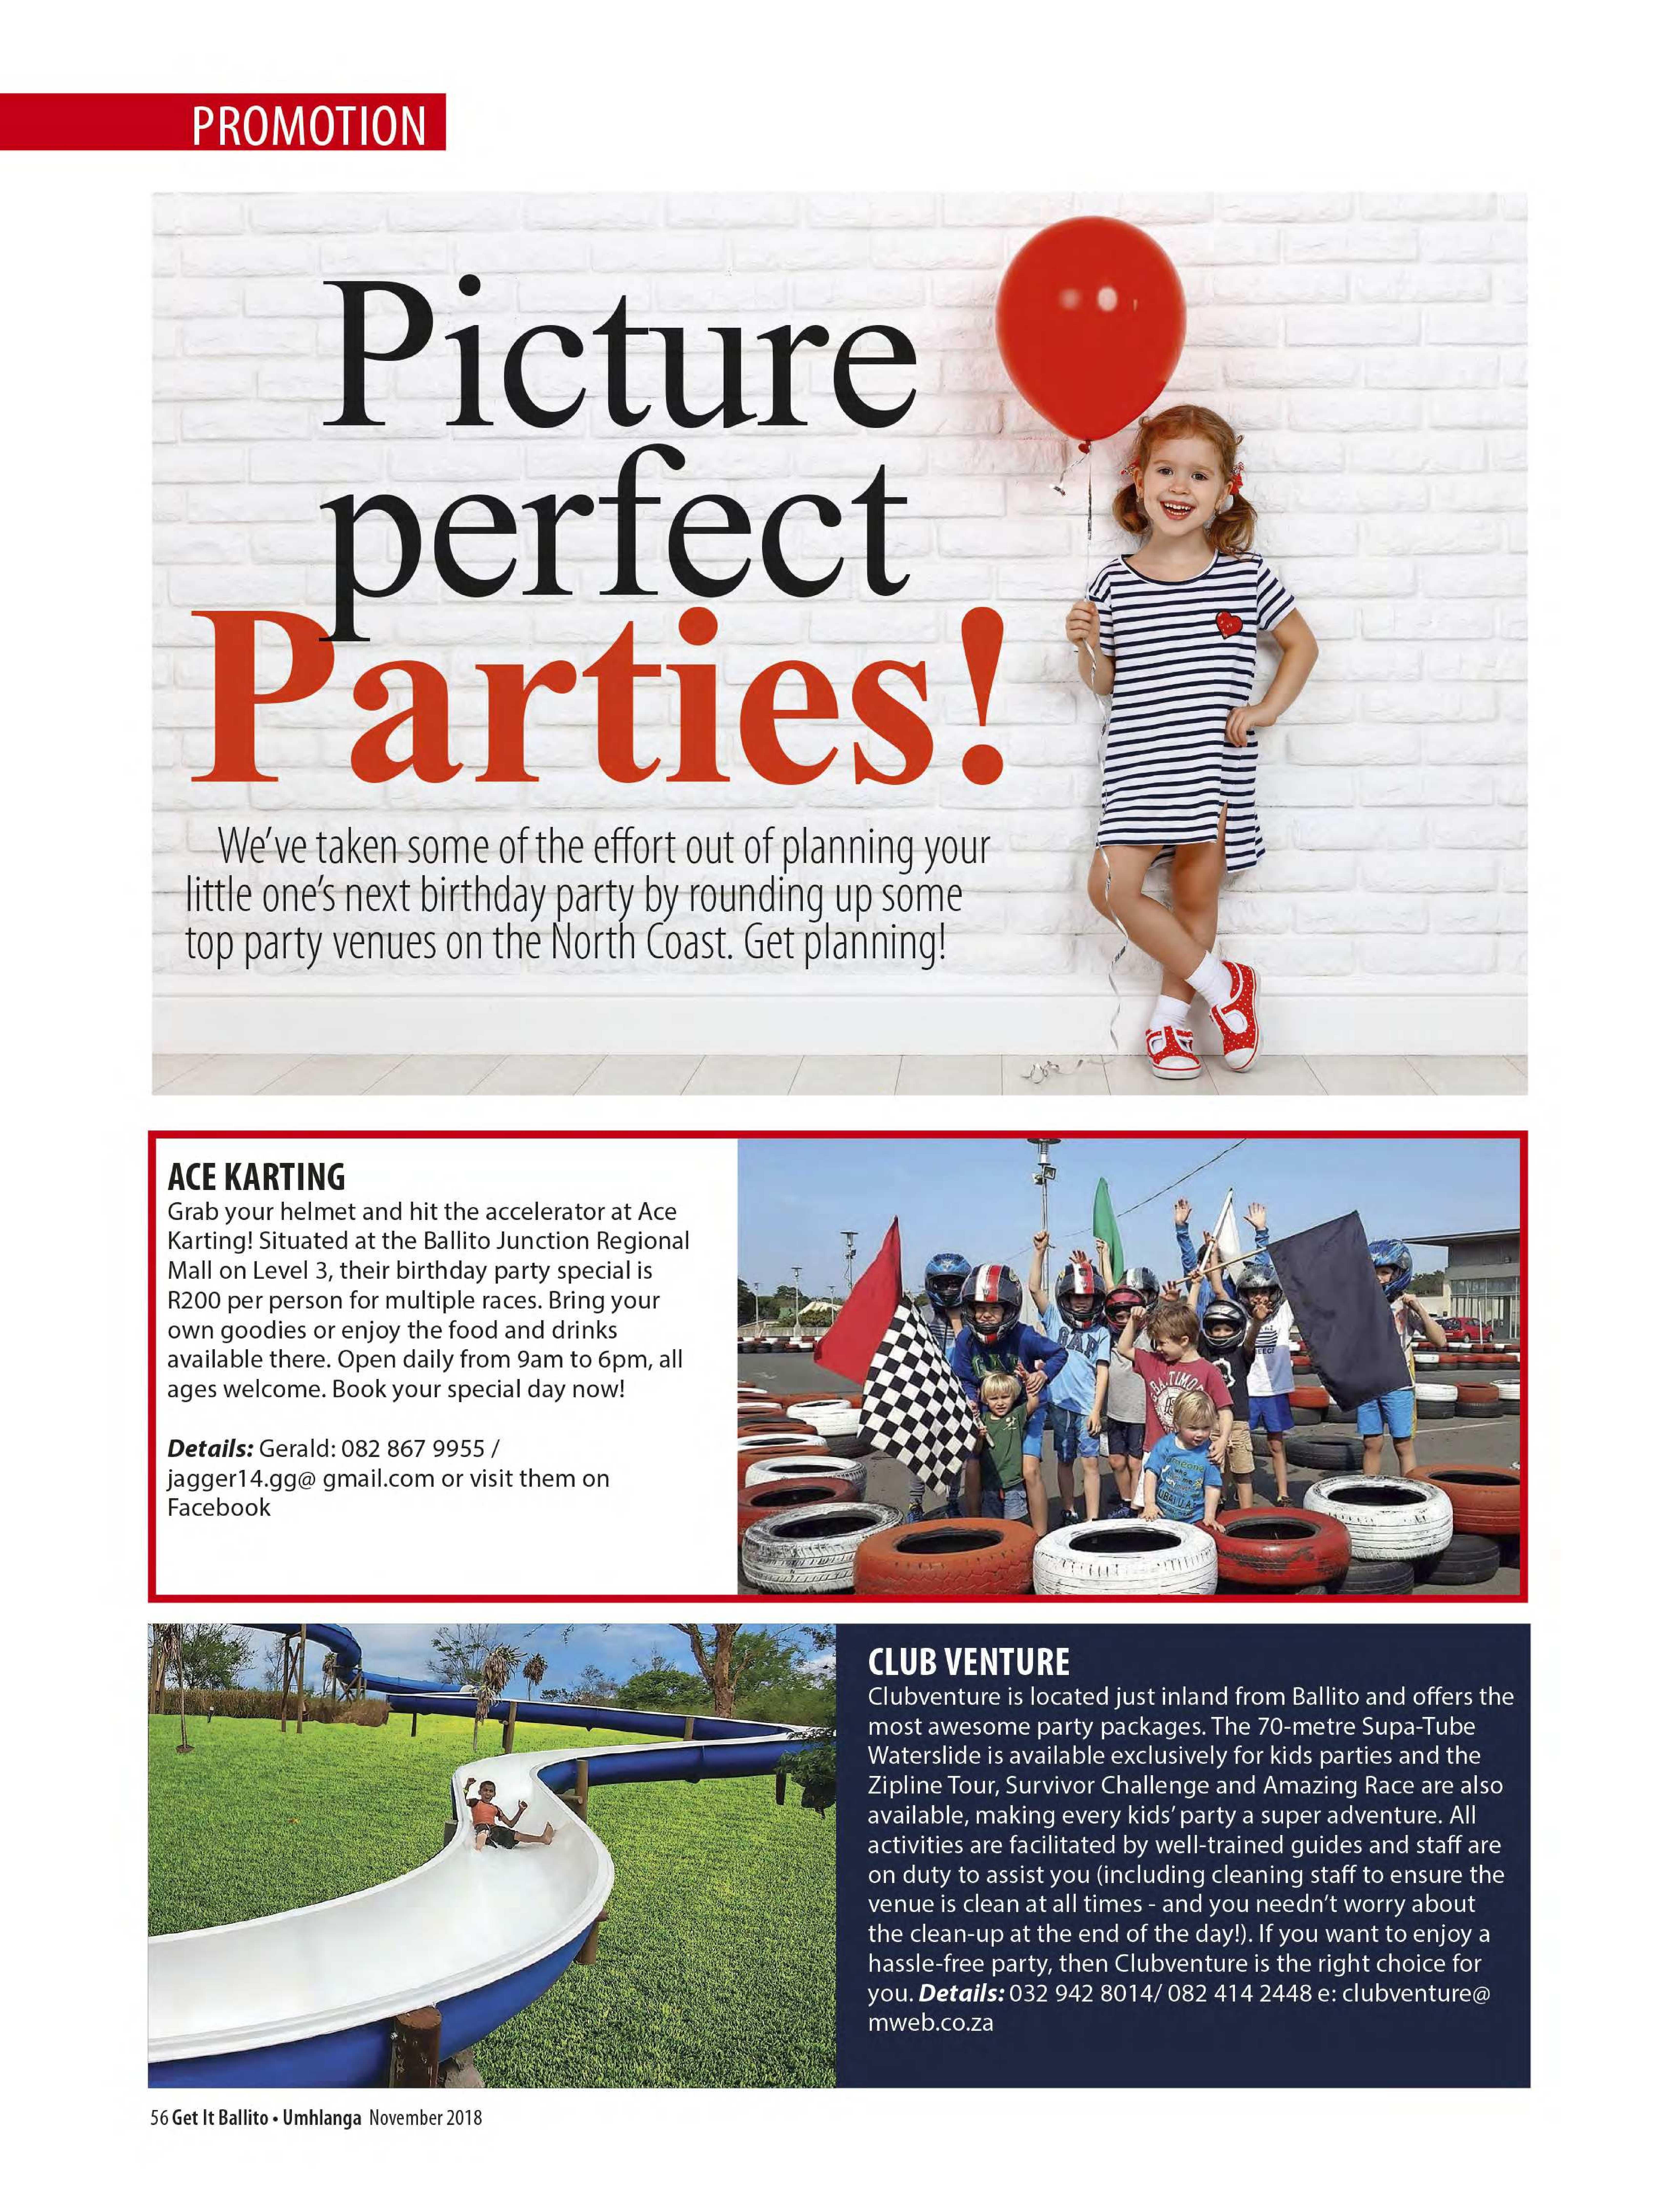 get-magazine-ballitoumhlanga-november-2018-epapers-page-58